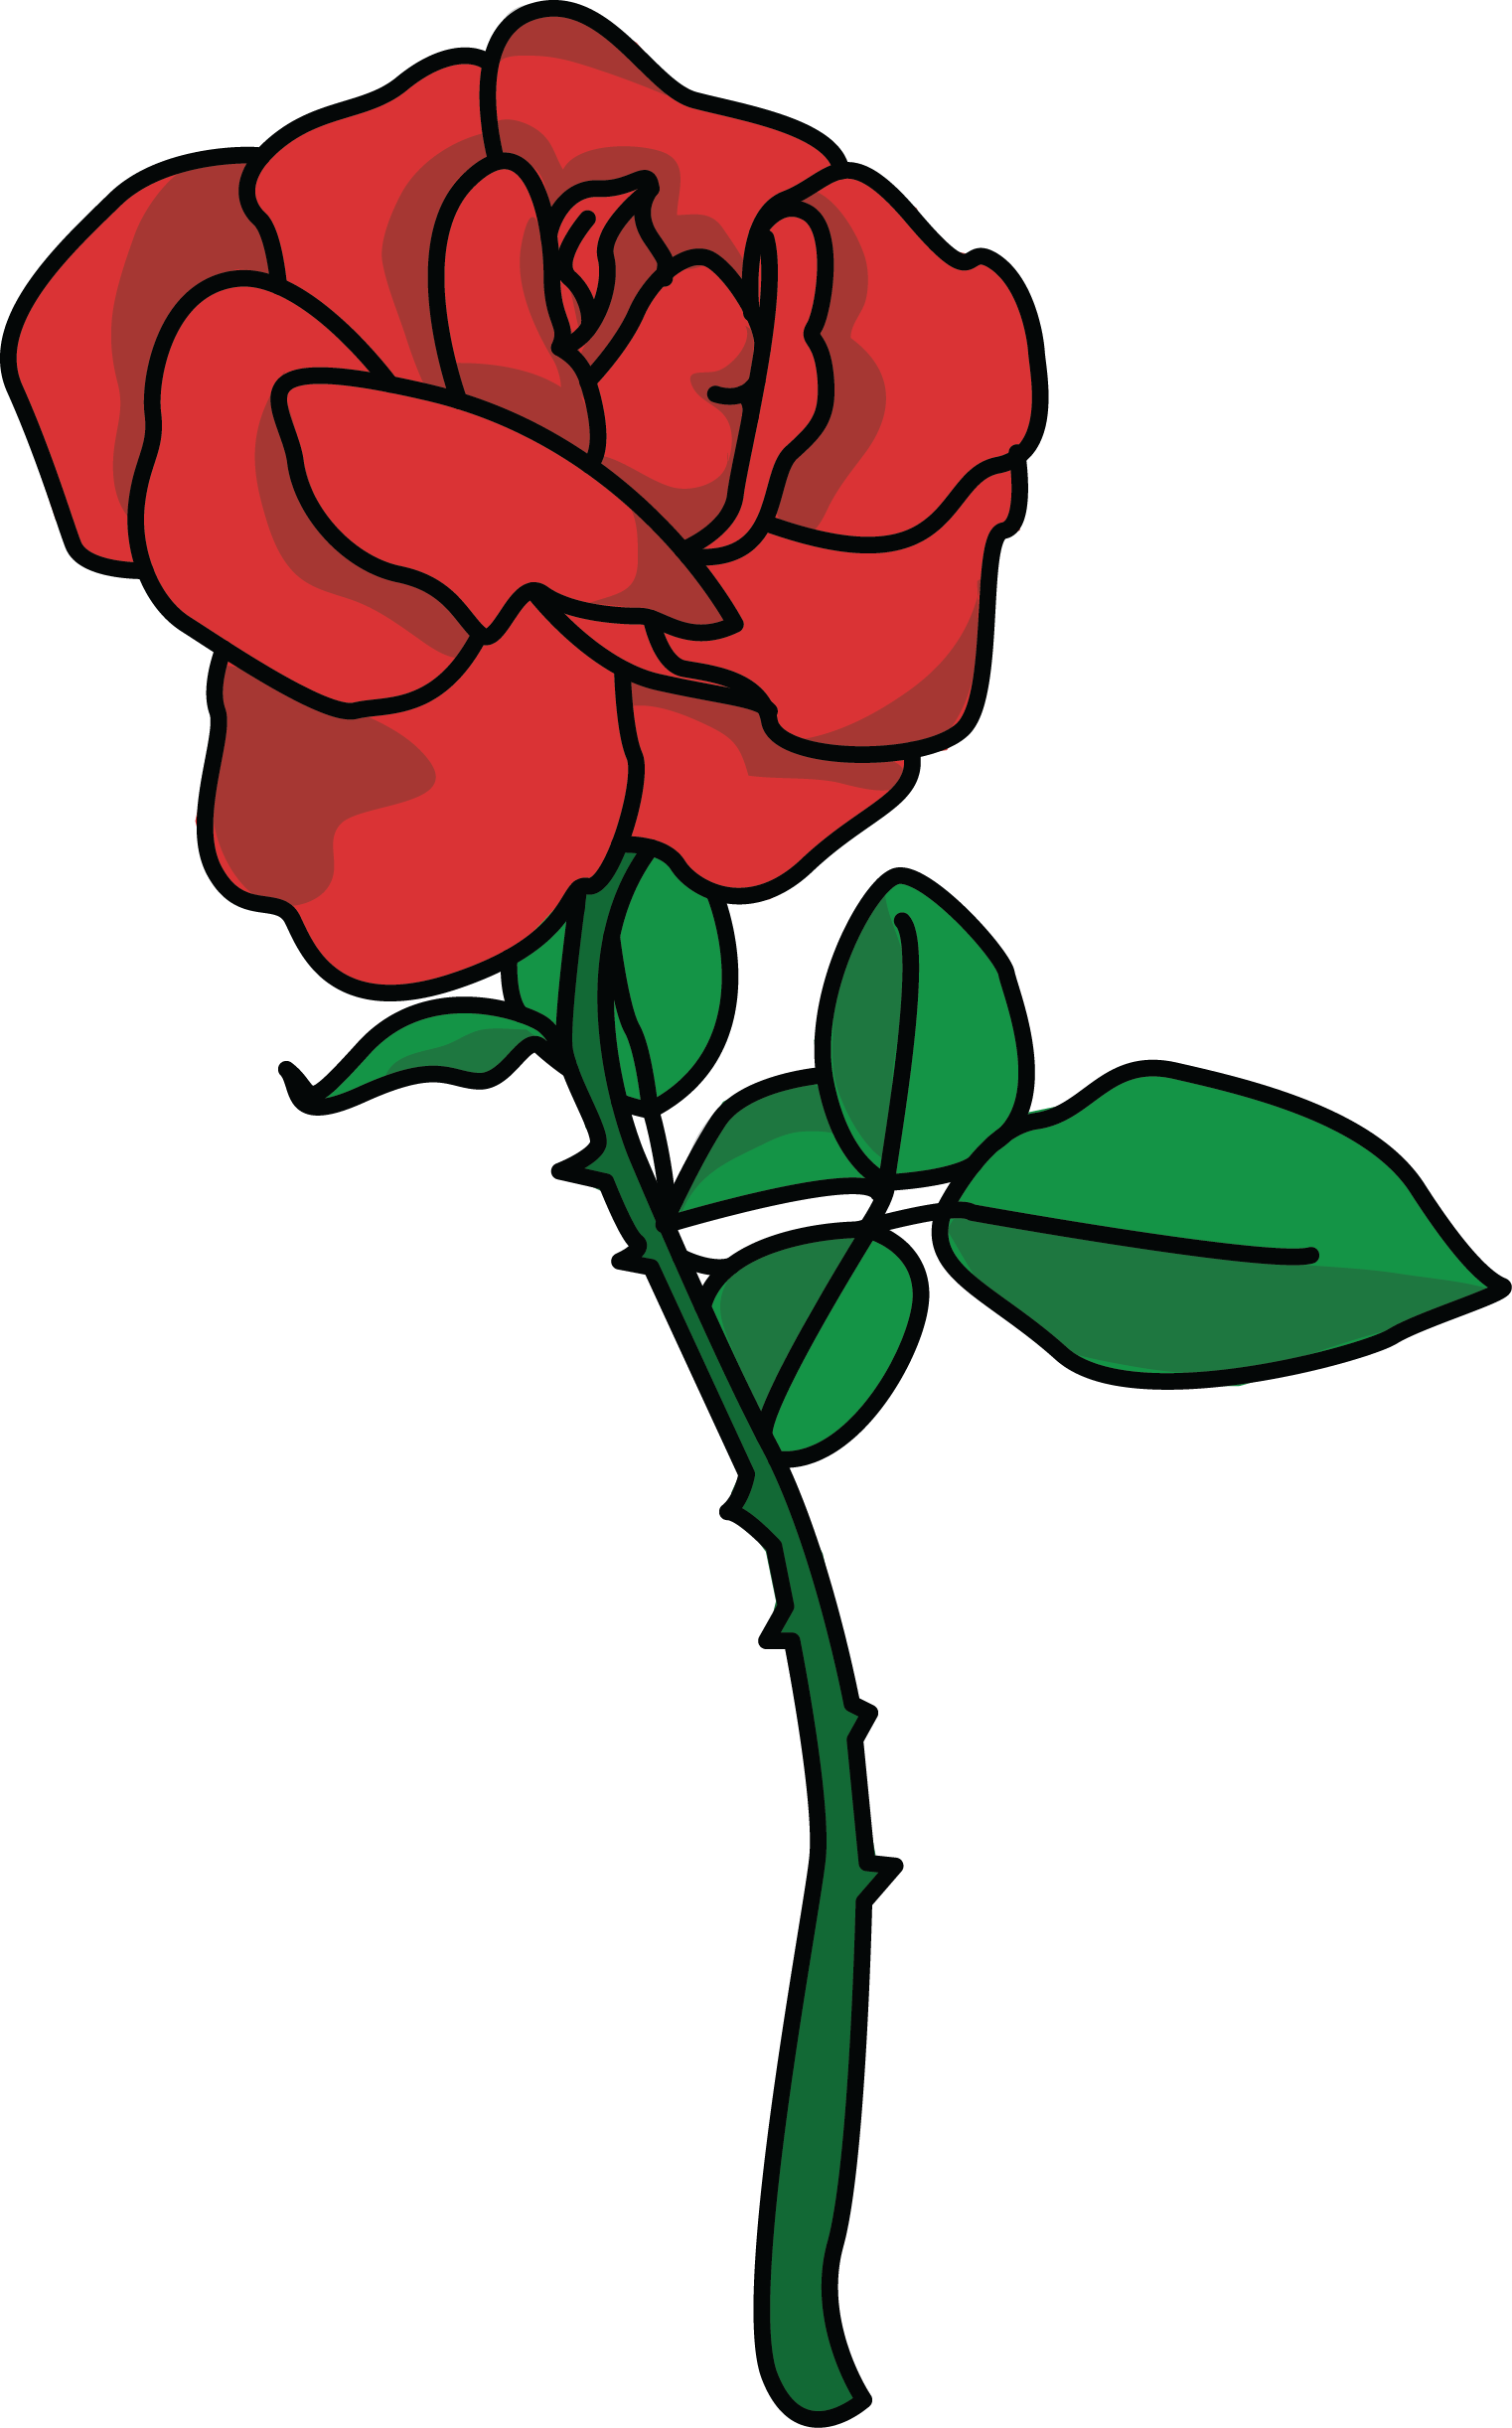 1522x2444 Free Rose Petal Clipart